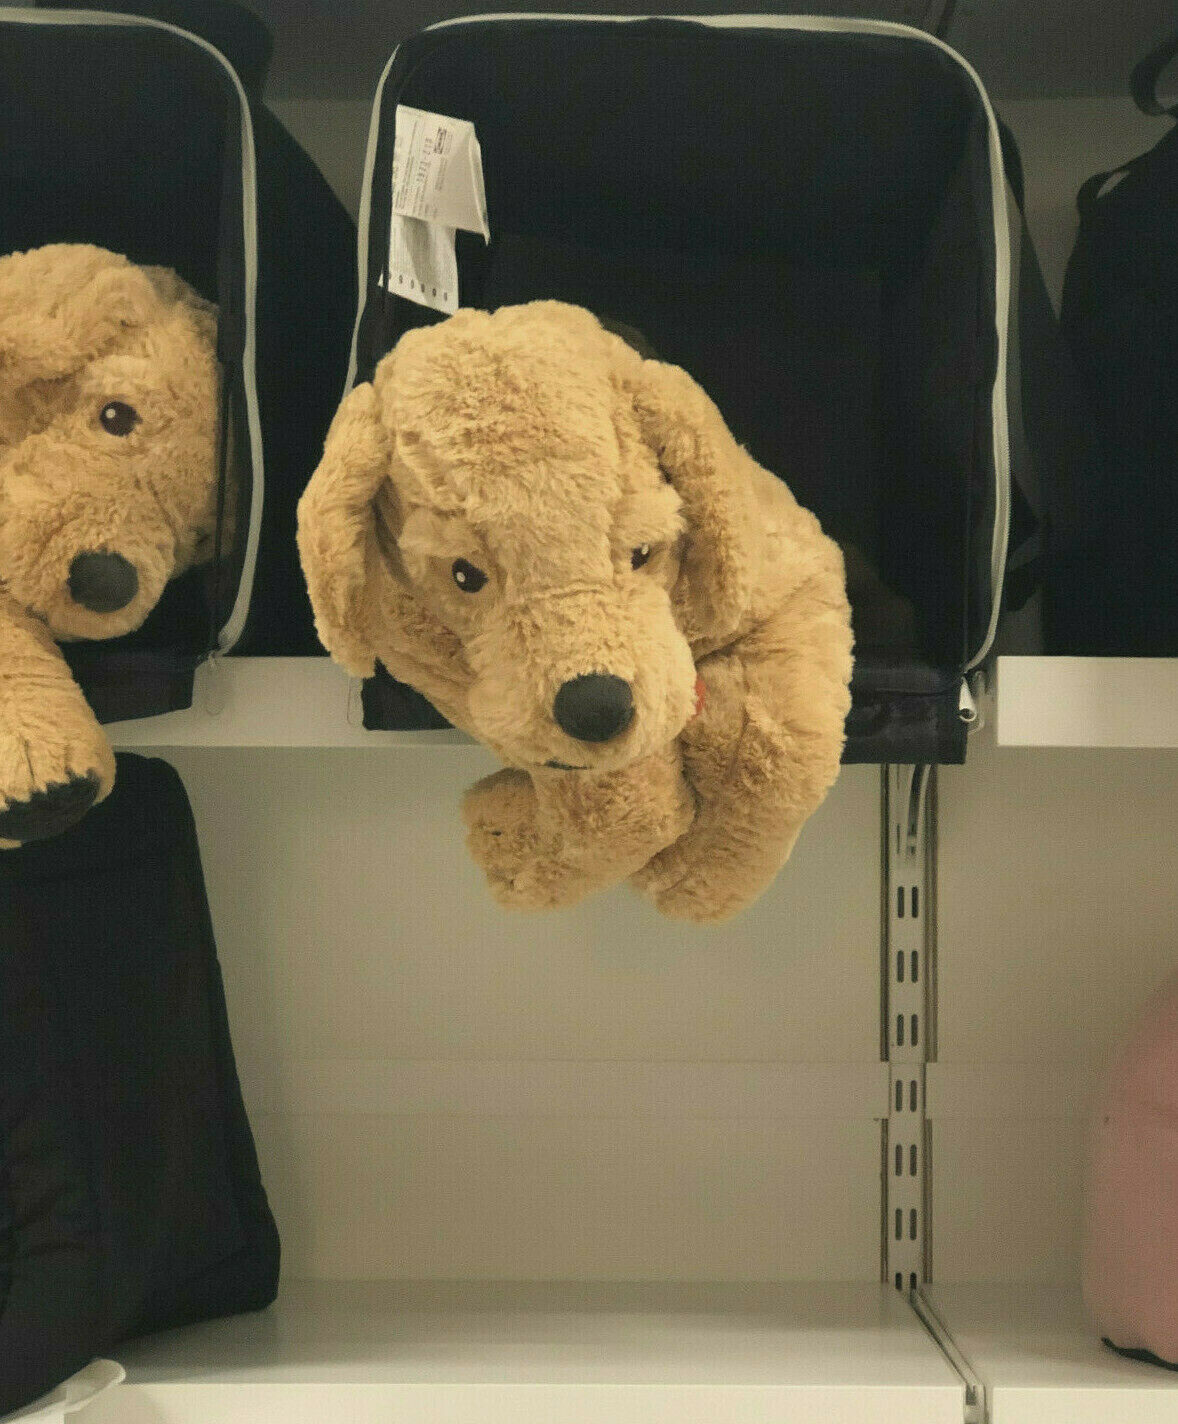 Ikea GOSIG GOLDEN 40 cm Kuscheltier Retriever Stofftier Hund Geschenk Kind NEU*